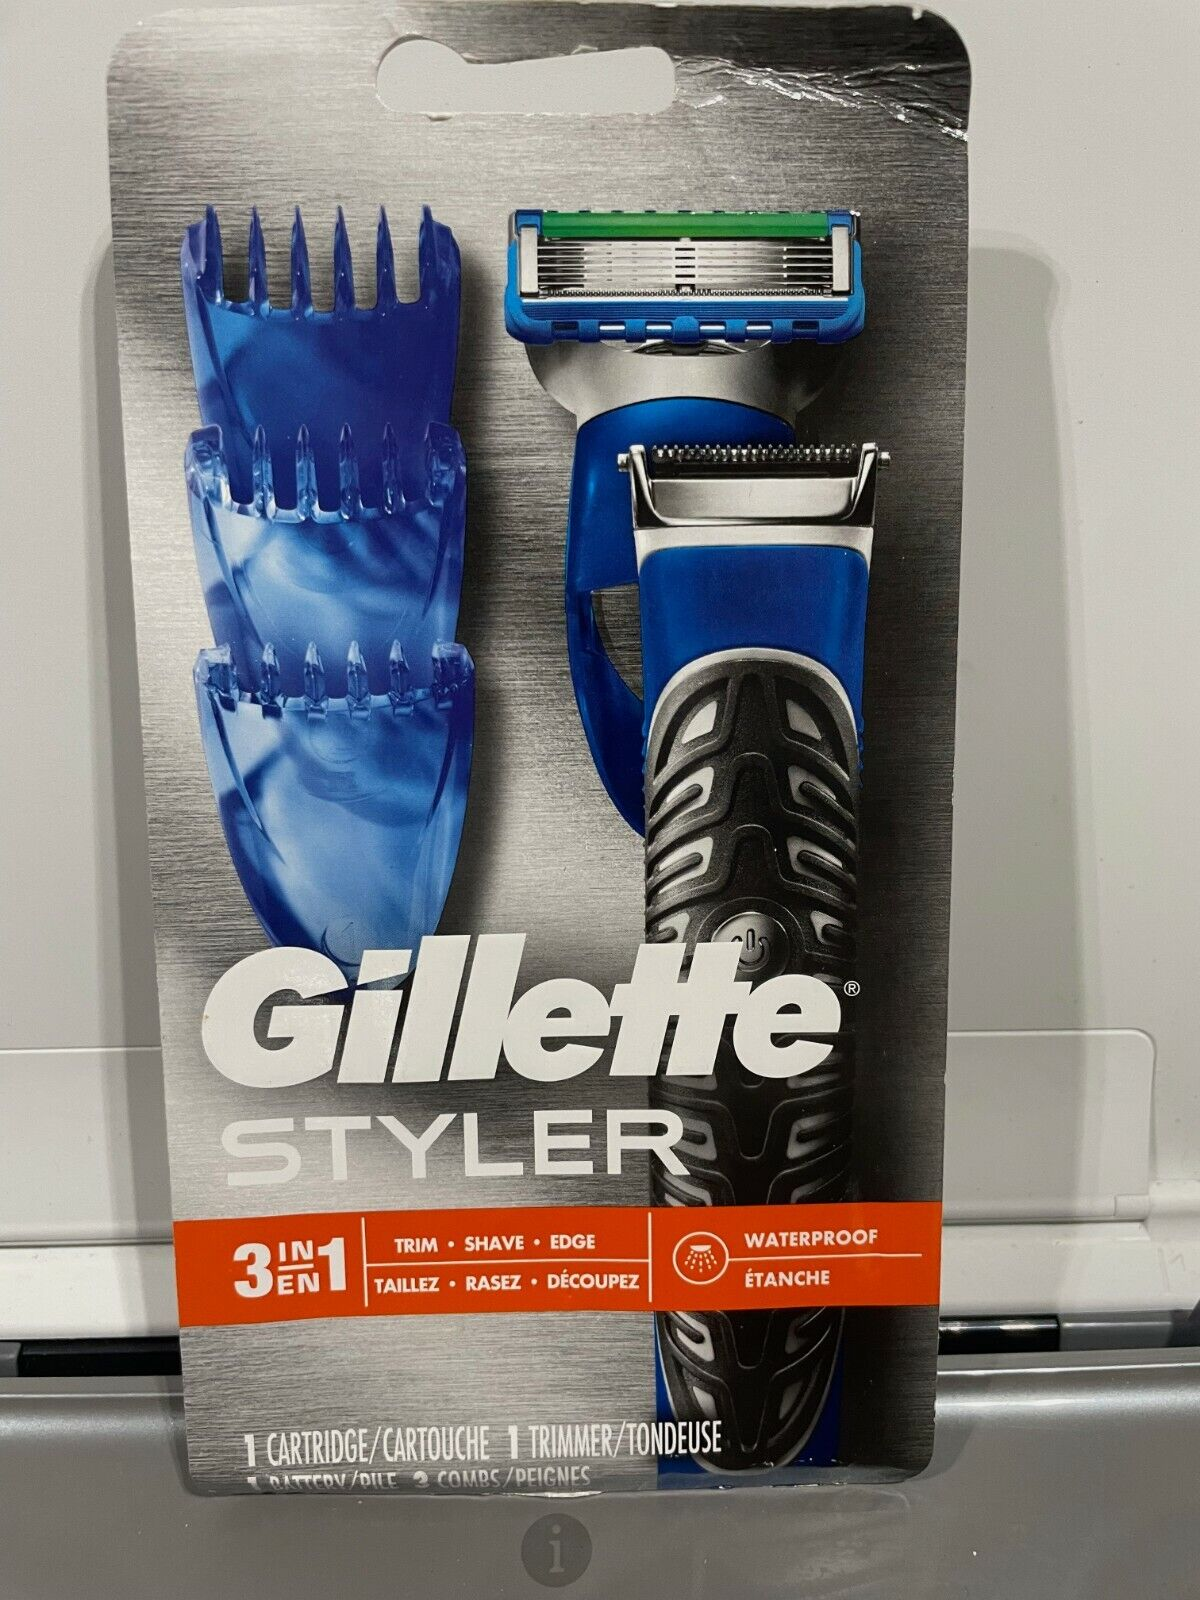 Gillette Styler 3 In 1 Trim Shave Edge Waterproof Men s Razor 1 Cartridge - $18.00